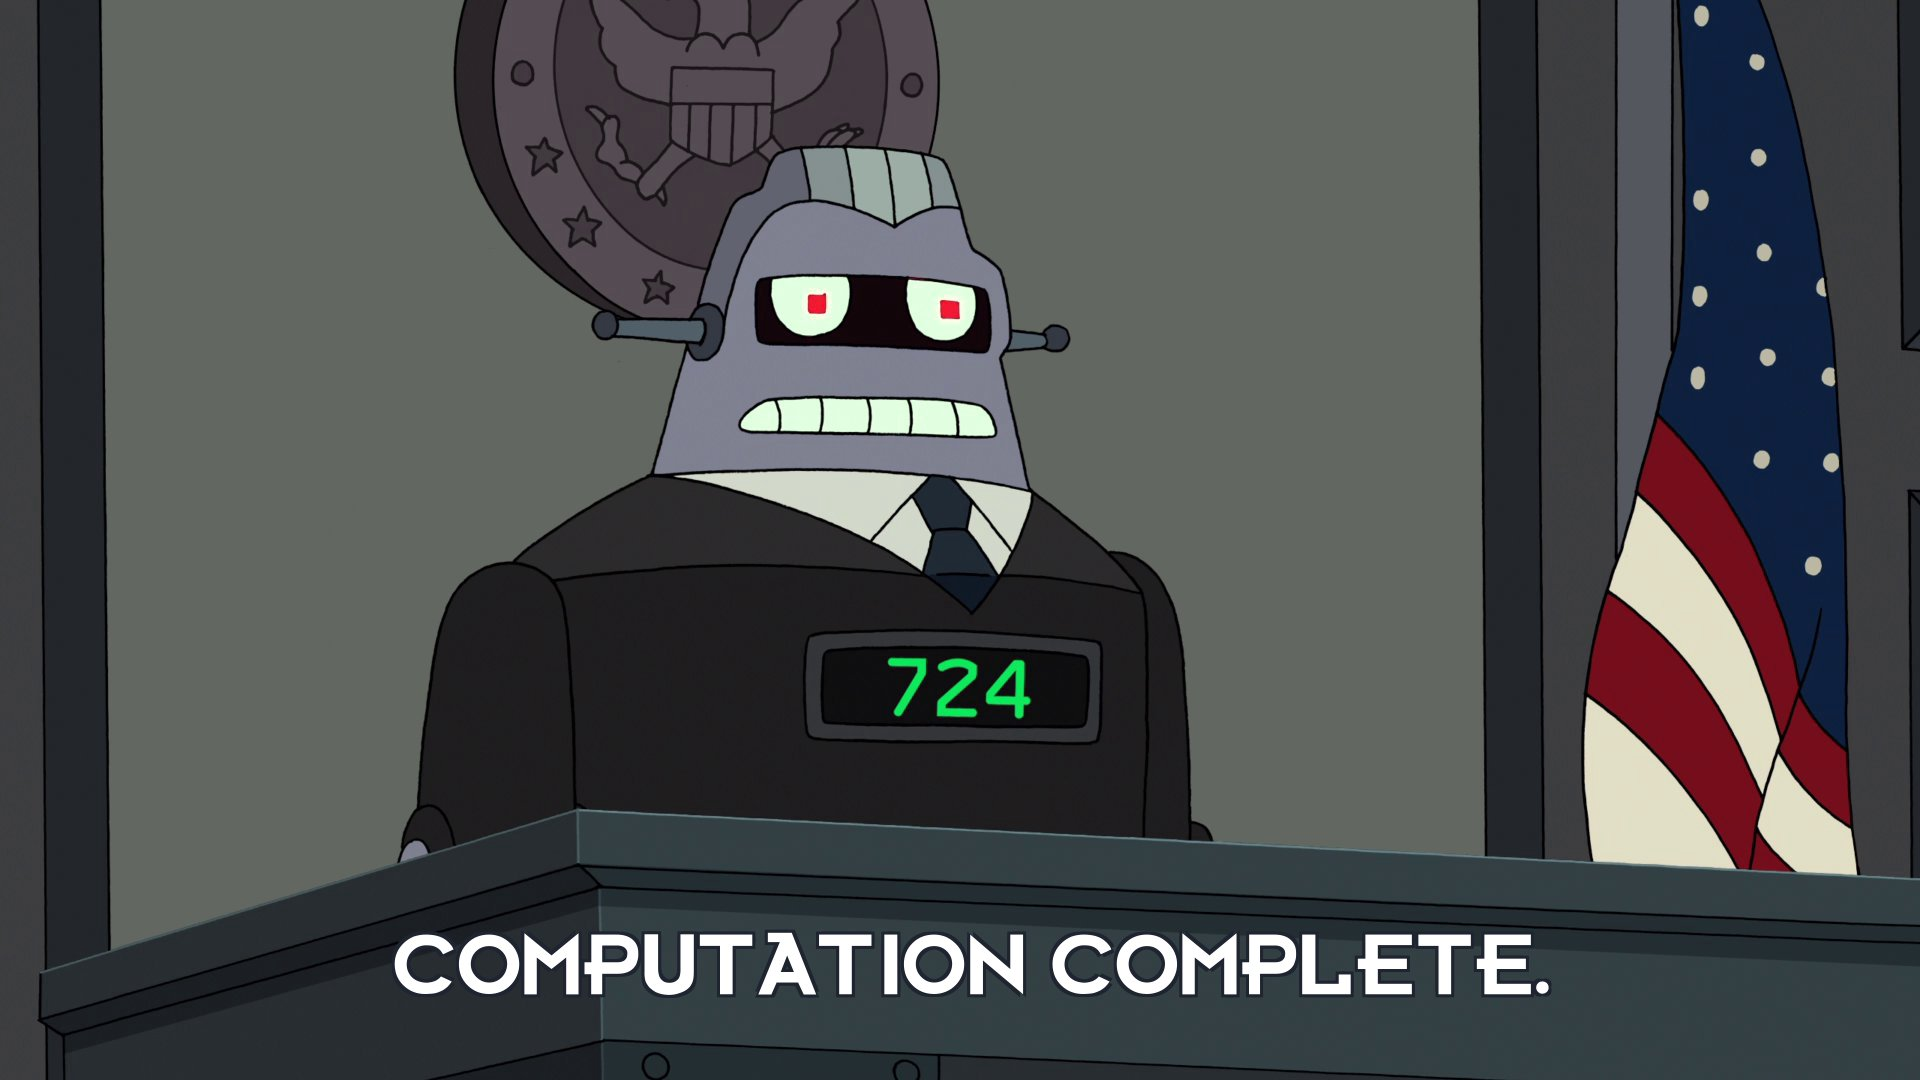 Judge 724: Computation complete.